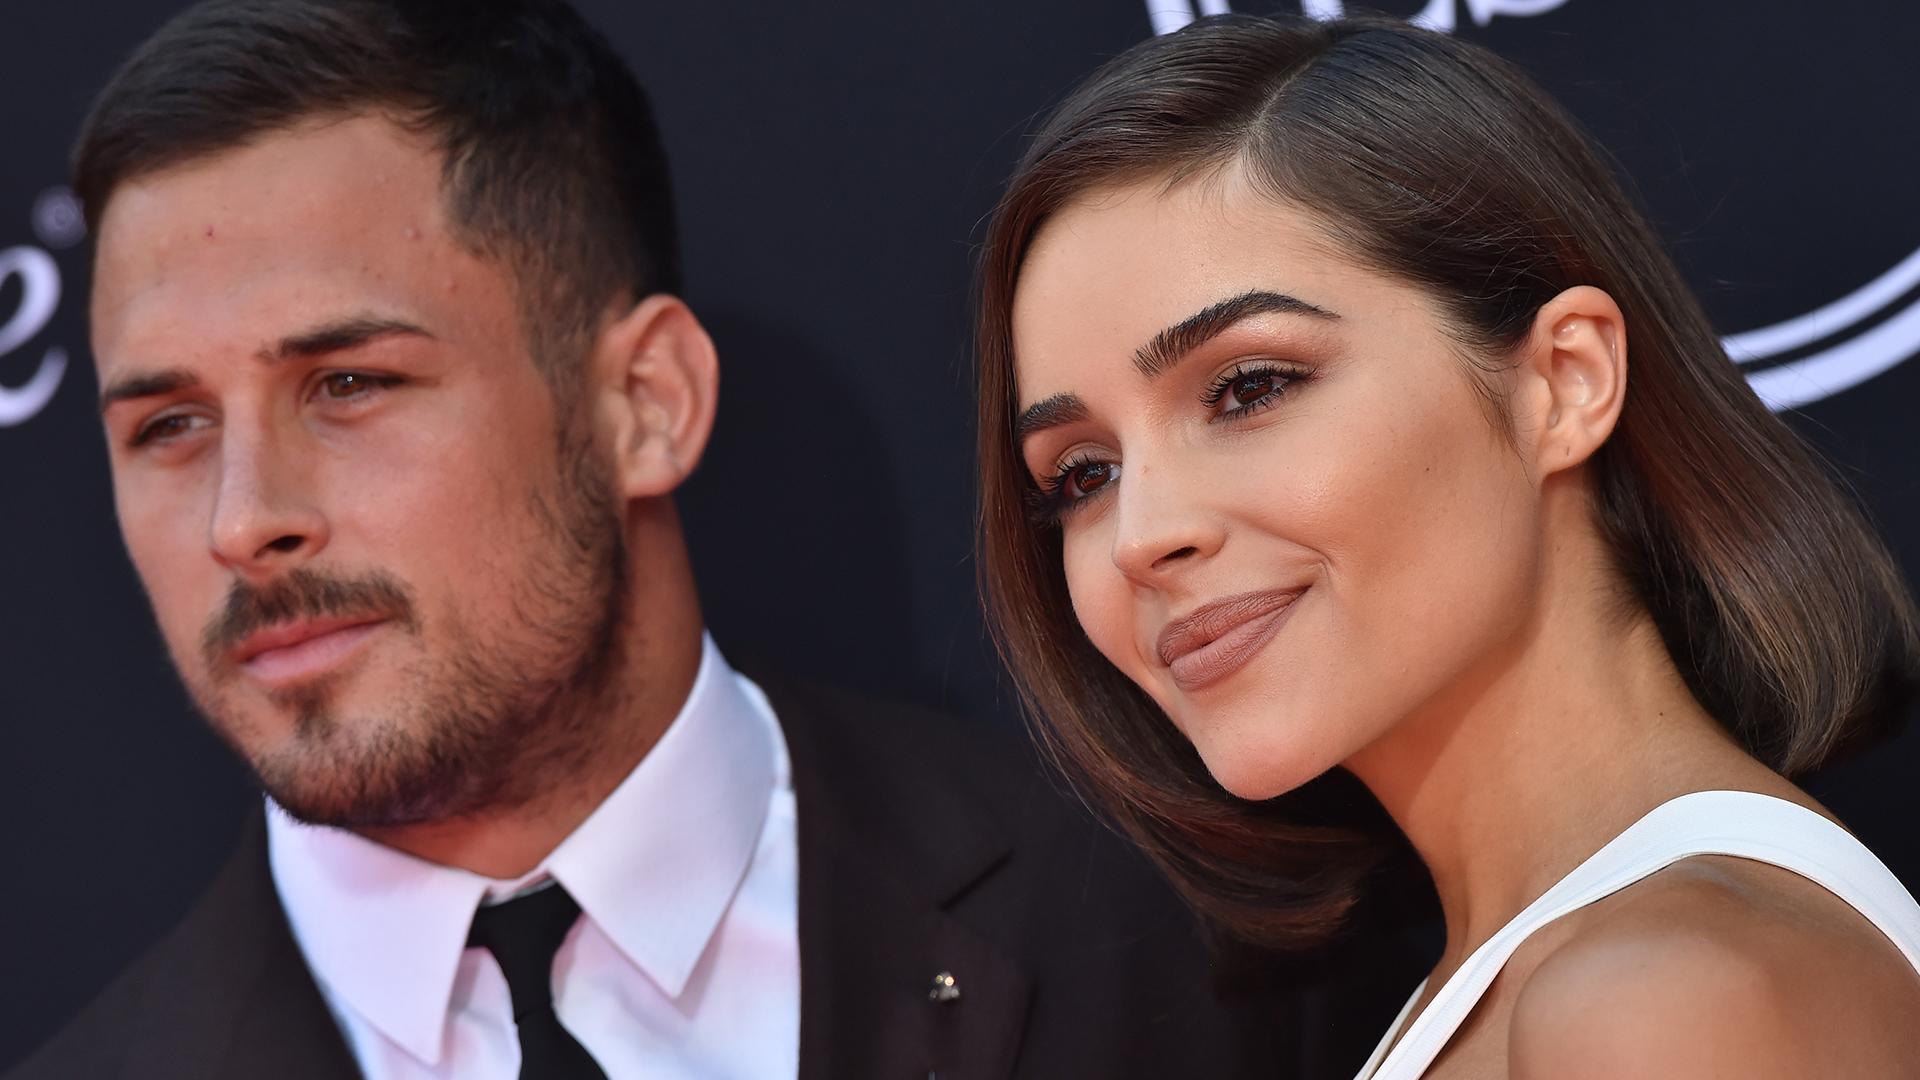 Olivia Culpo's Ex Danny Amendola Blasts Her Instagram Use … on Instagram